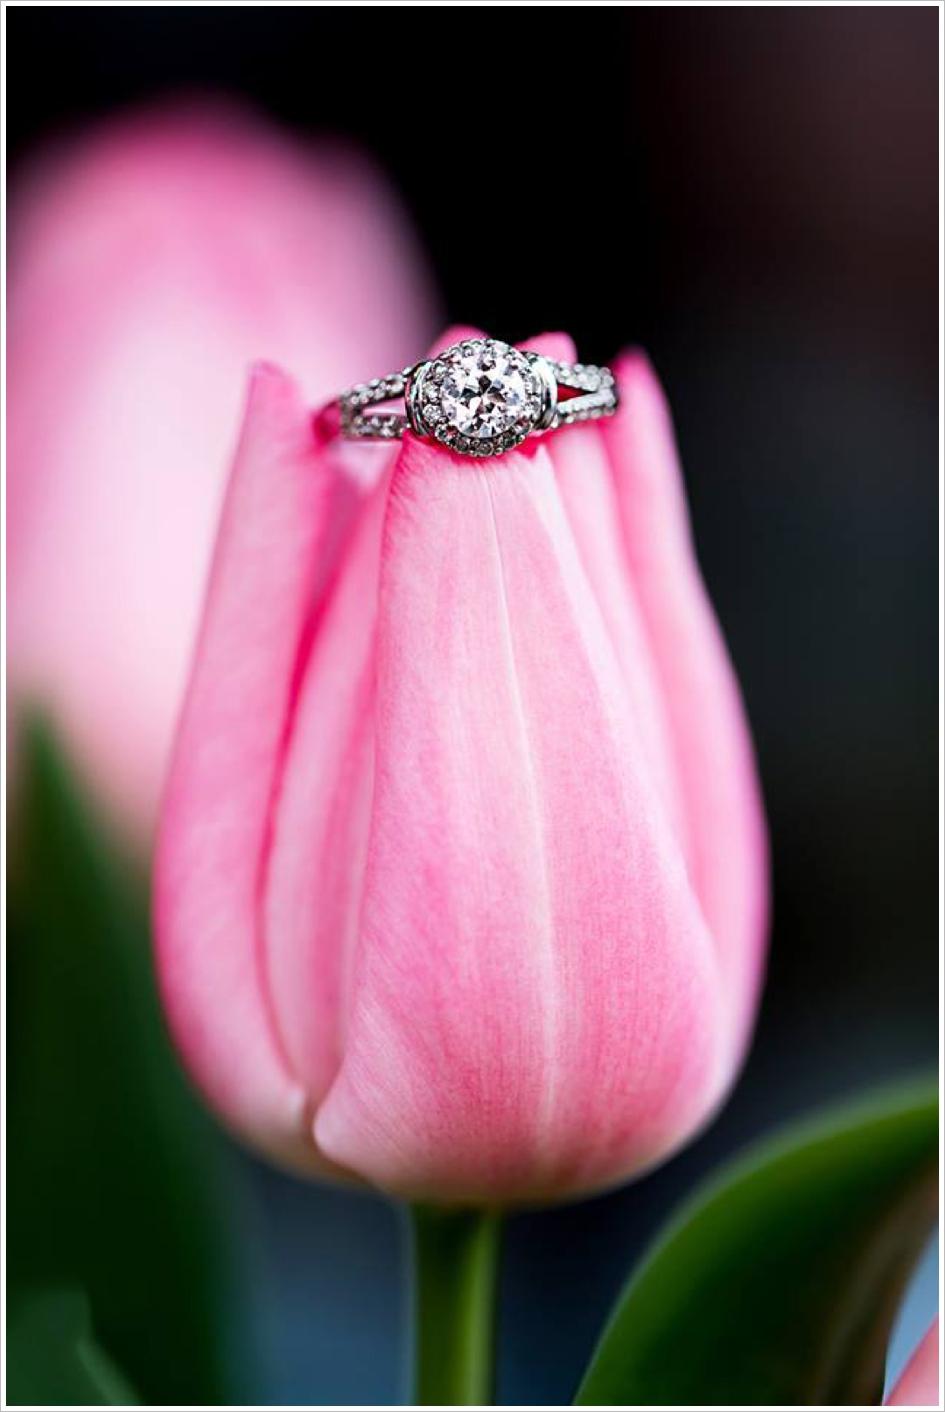 Creative Wedding Ring Photo